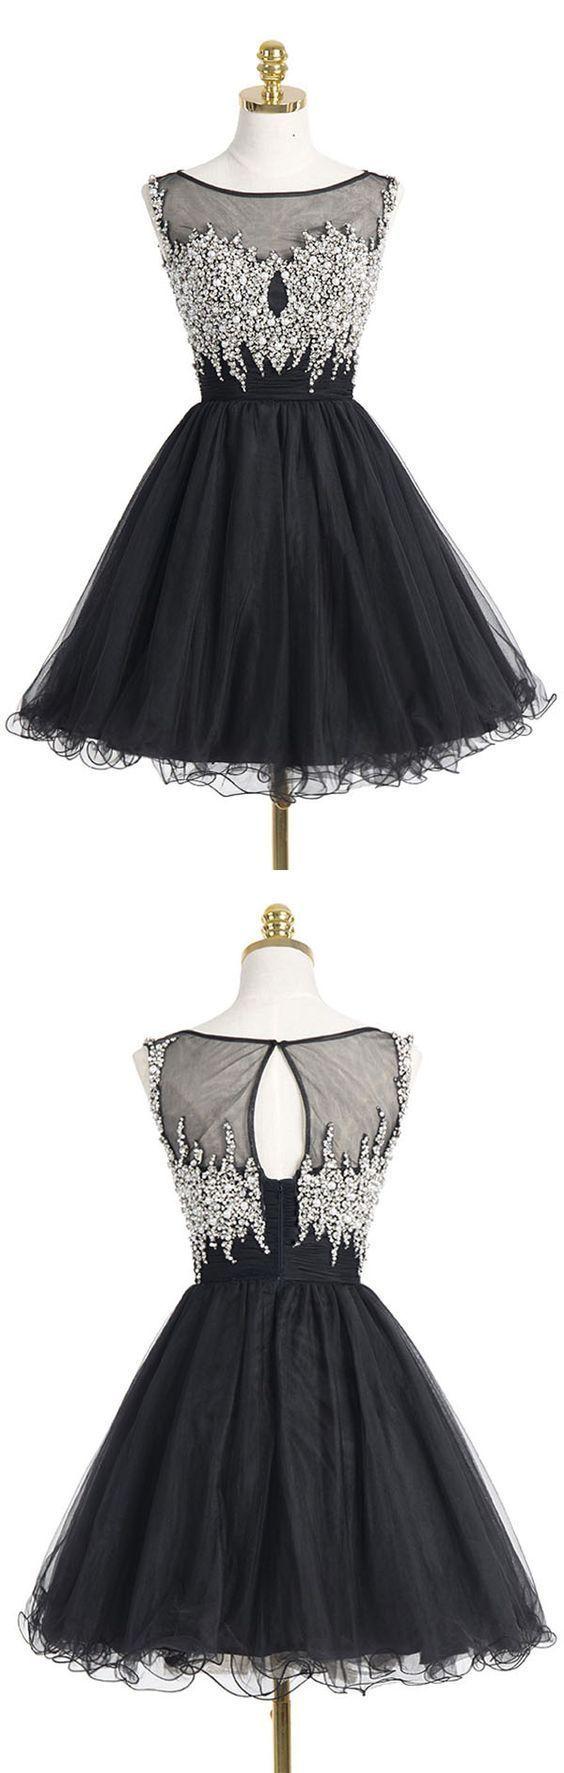 Short Homecoming Dress,Black Homecoming Dress,cute Homecoming Dresses,Short Prom